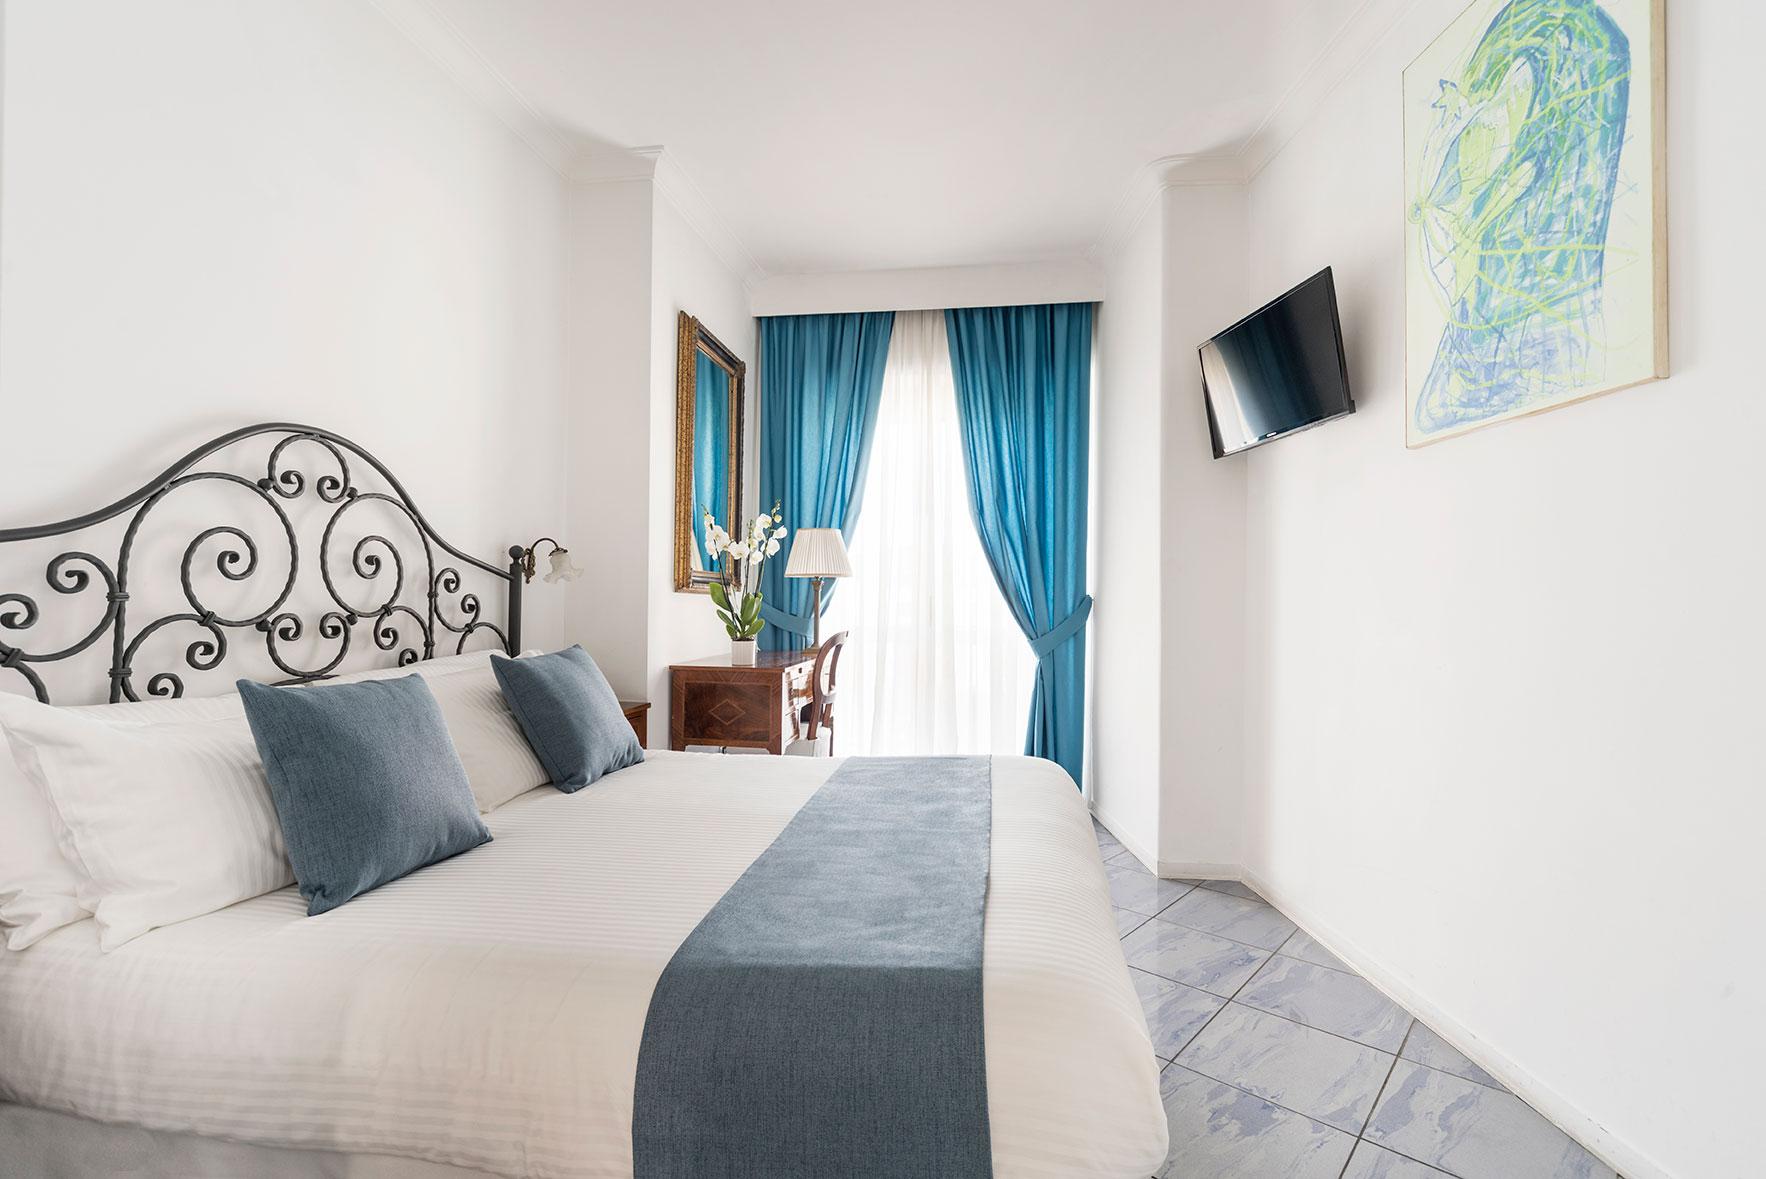 camere-standard-fiorentini-residence-napoli-10